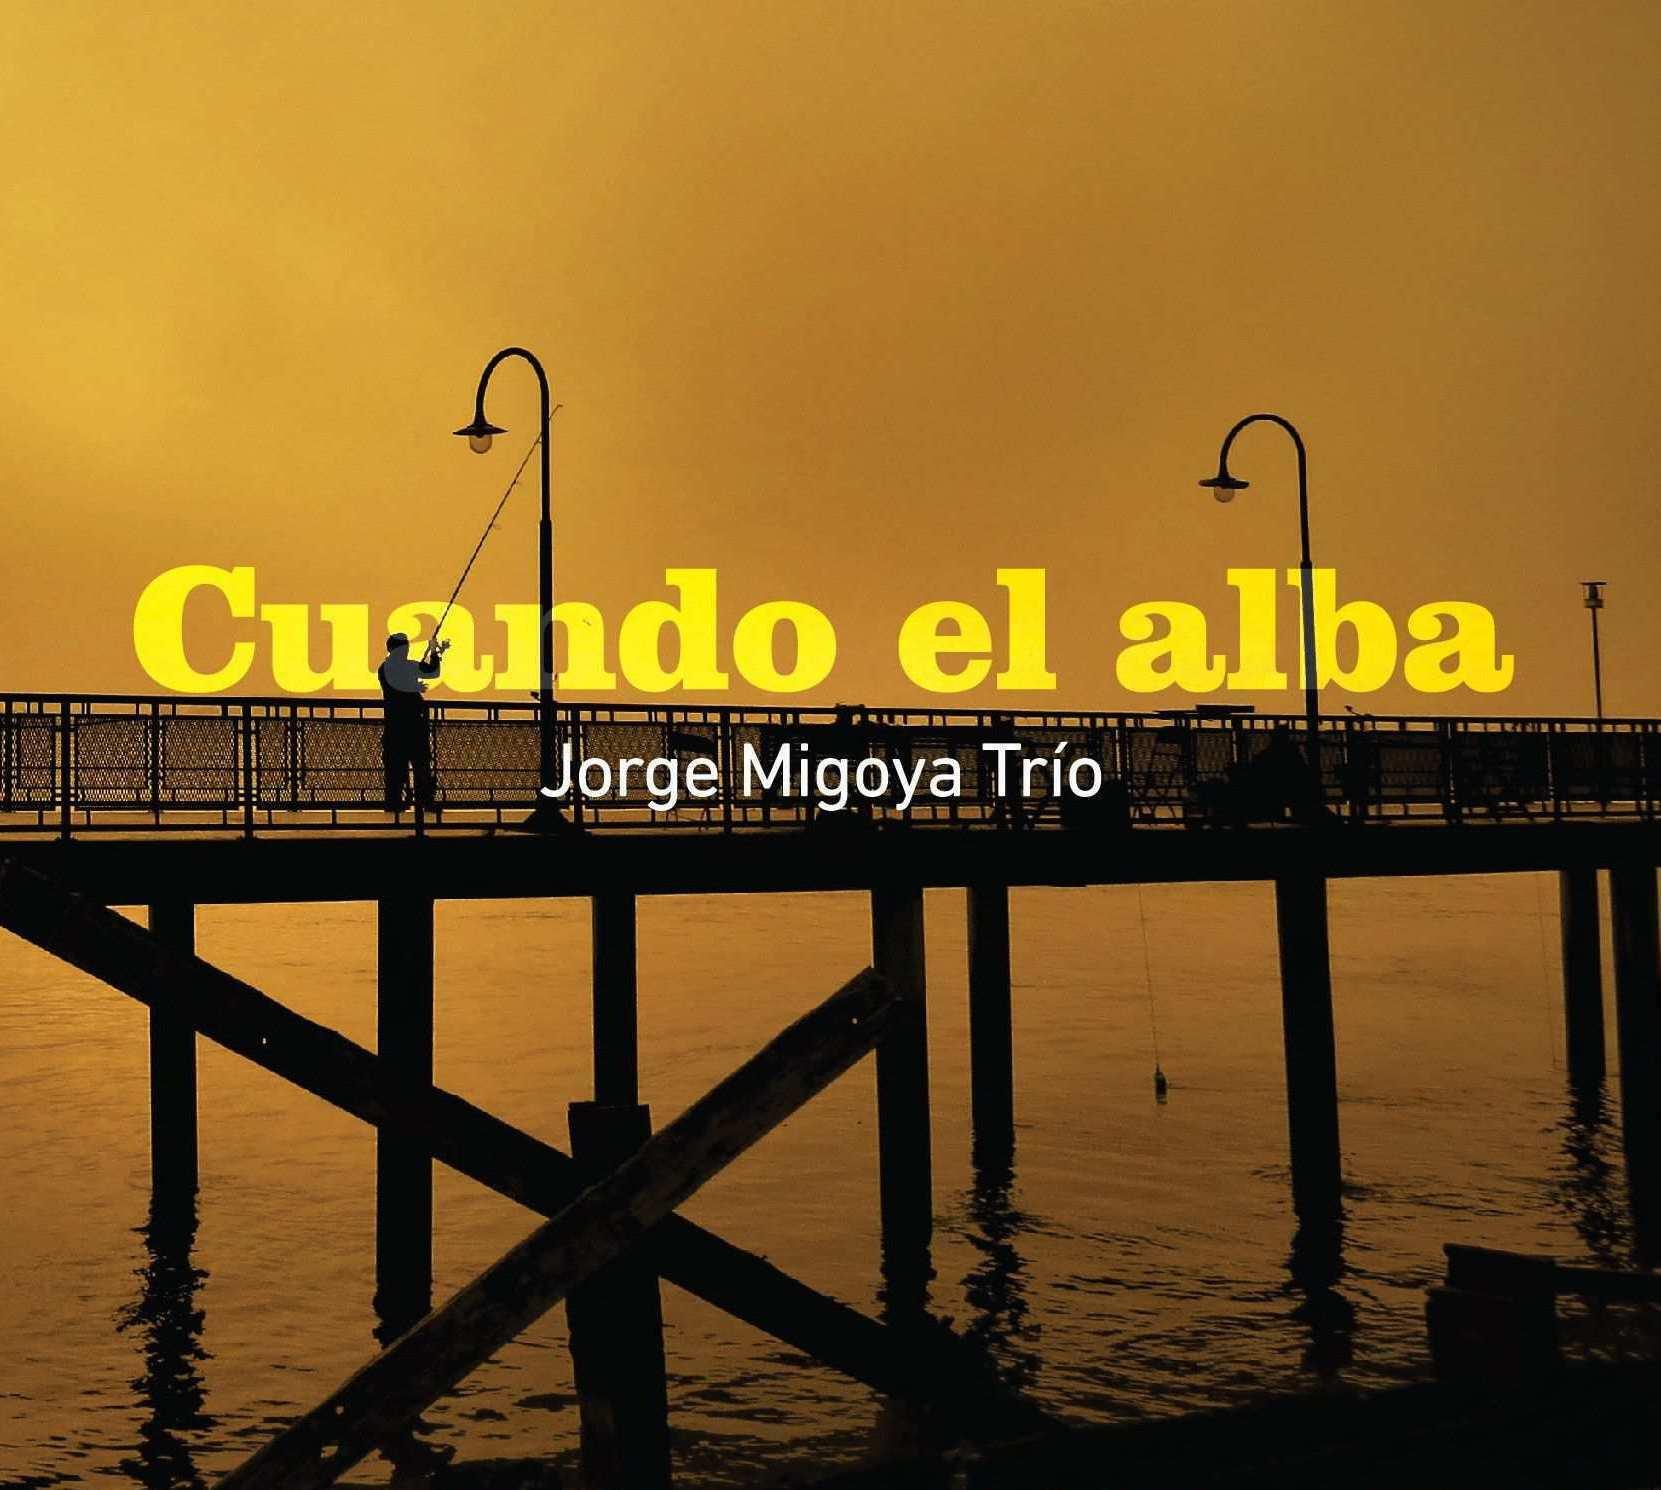 http://argentjazz.com.ar/wp-content/uploads/2018/01/cd_migoya.jpg